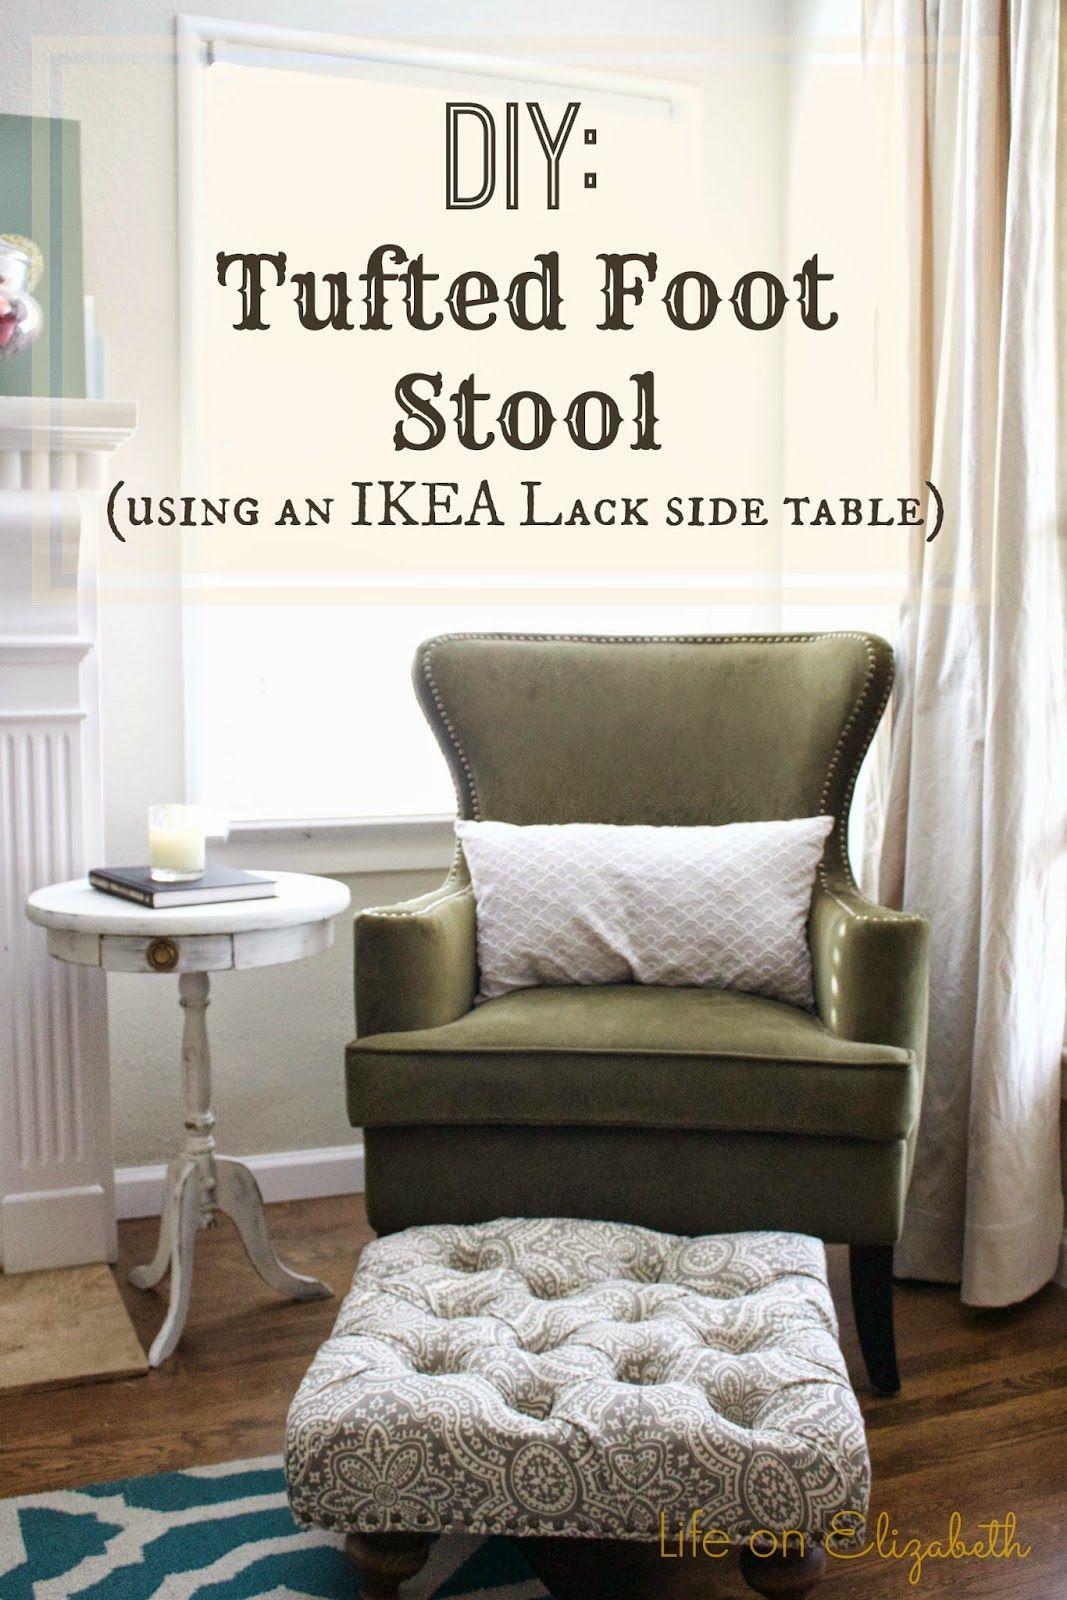 Life On Elizabeth Diy Tufted Ottoman With Ikea Lack Side